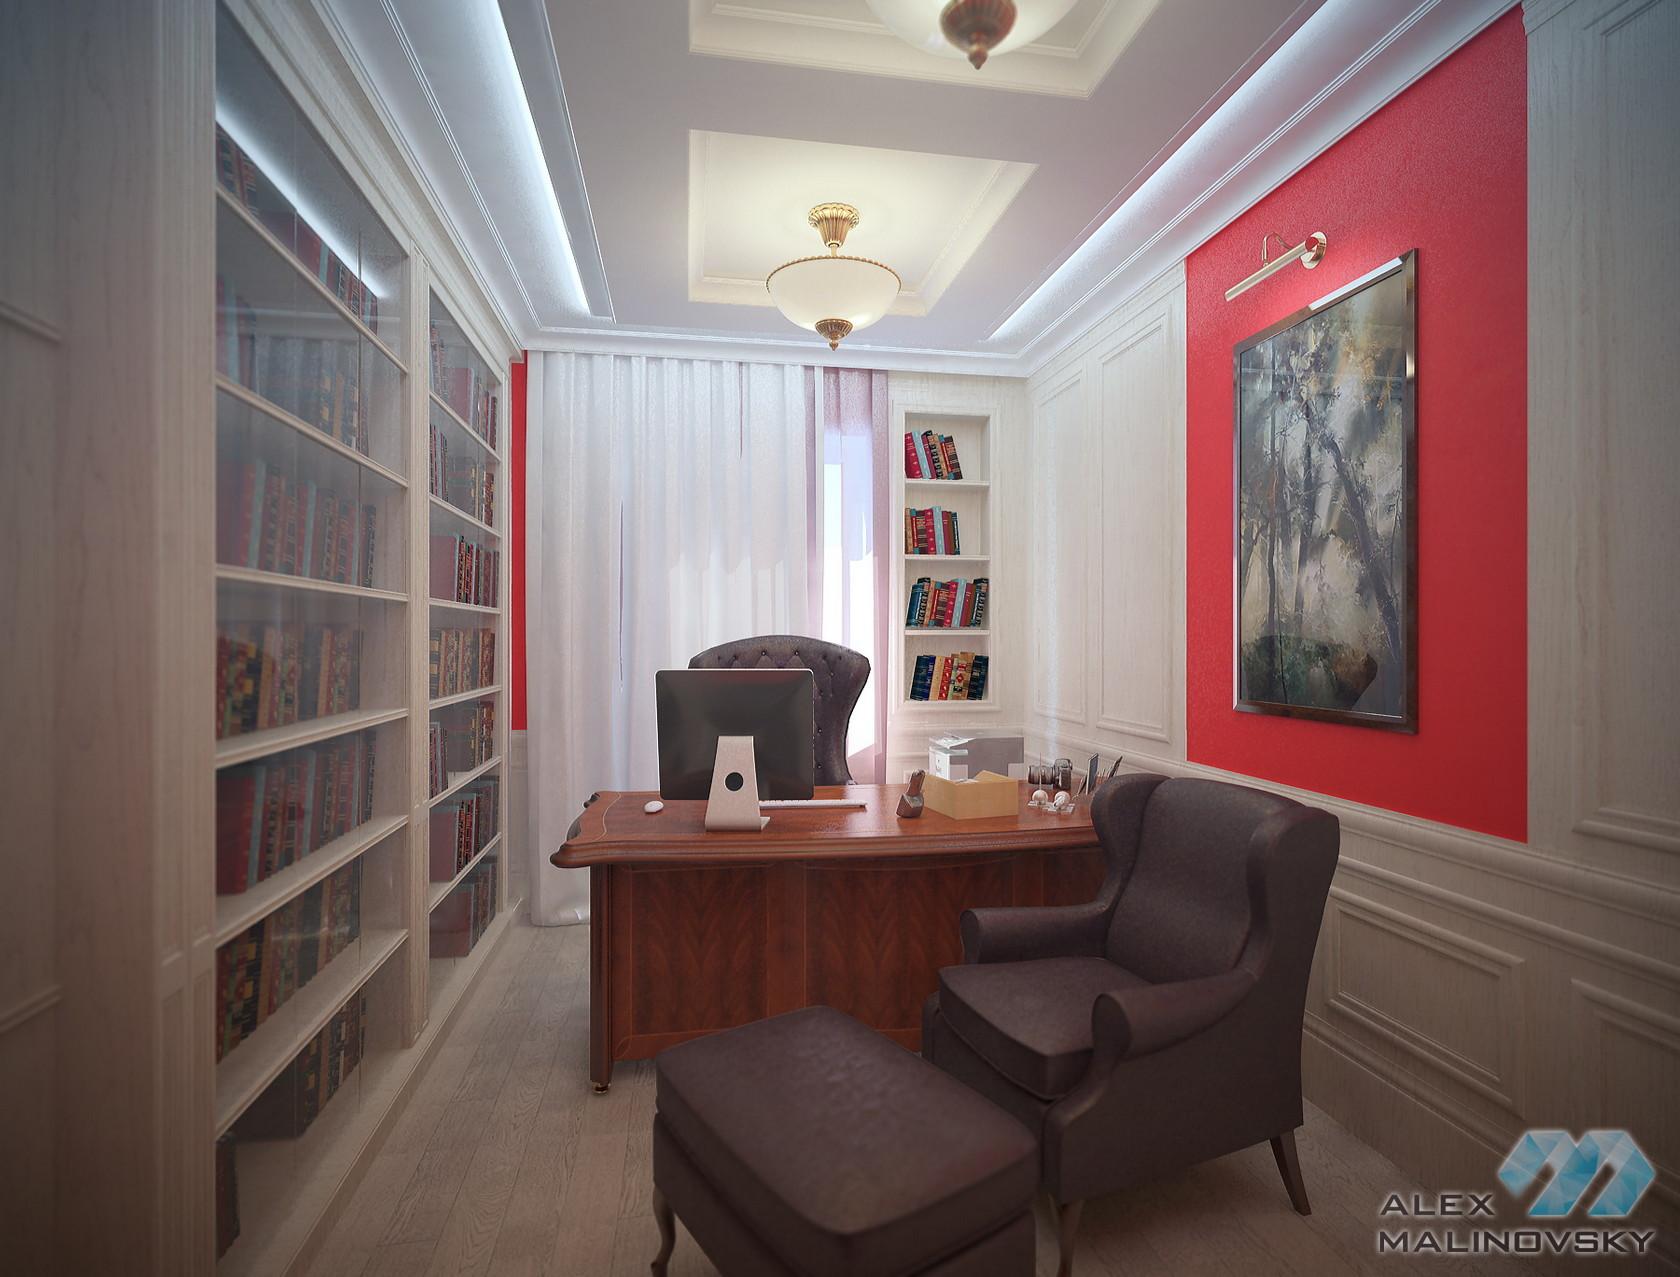 Кабинет, 4х комнатная квартира, ЖК Парус, СПб